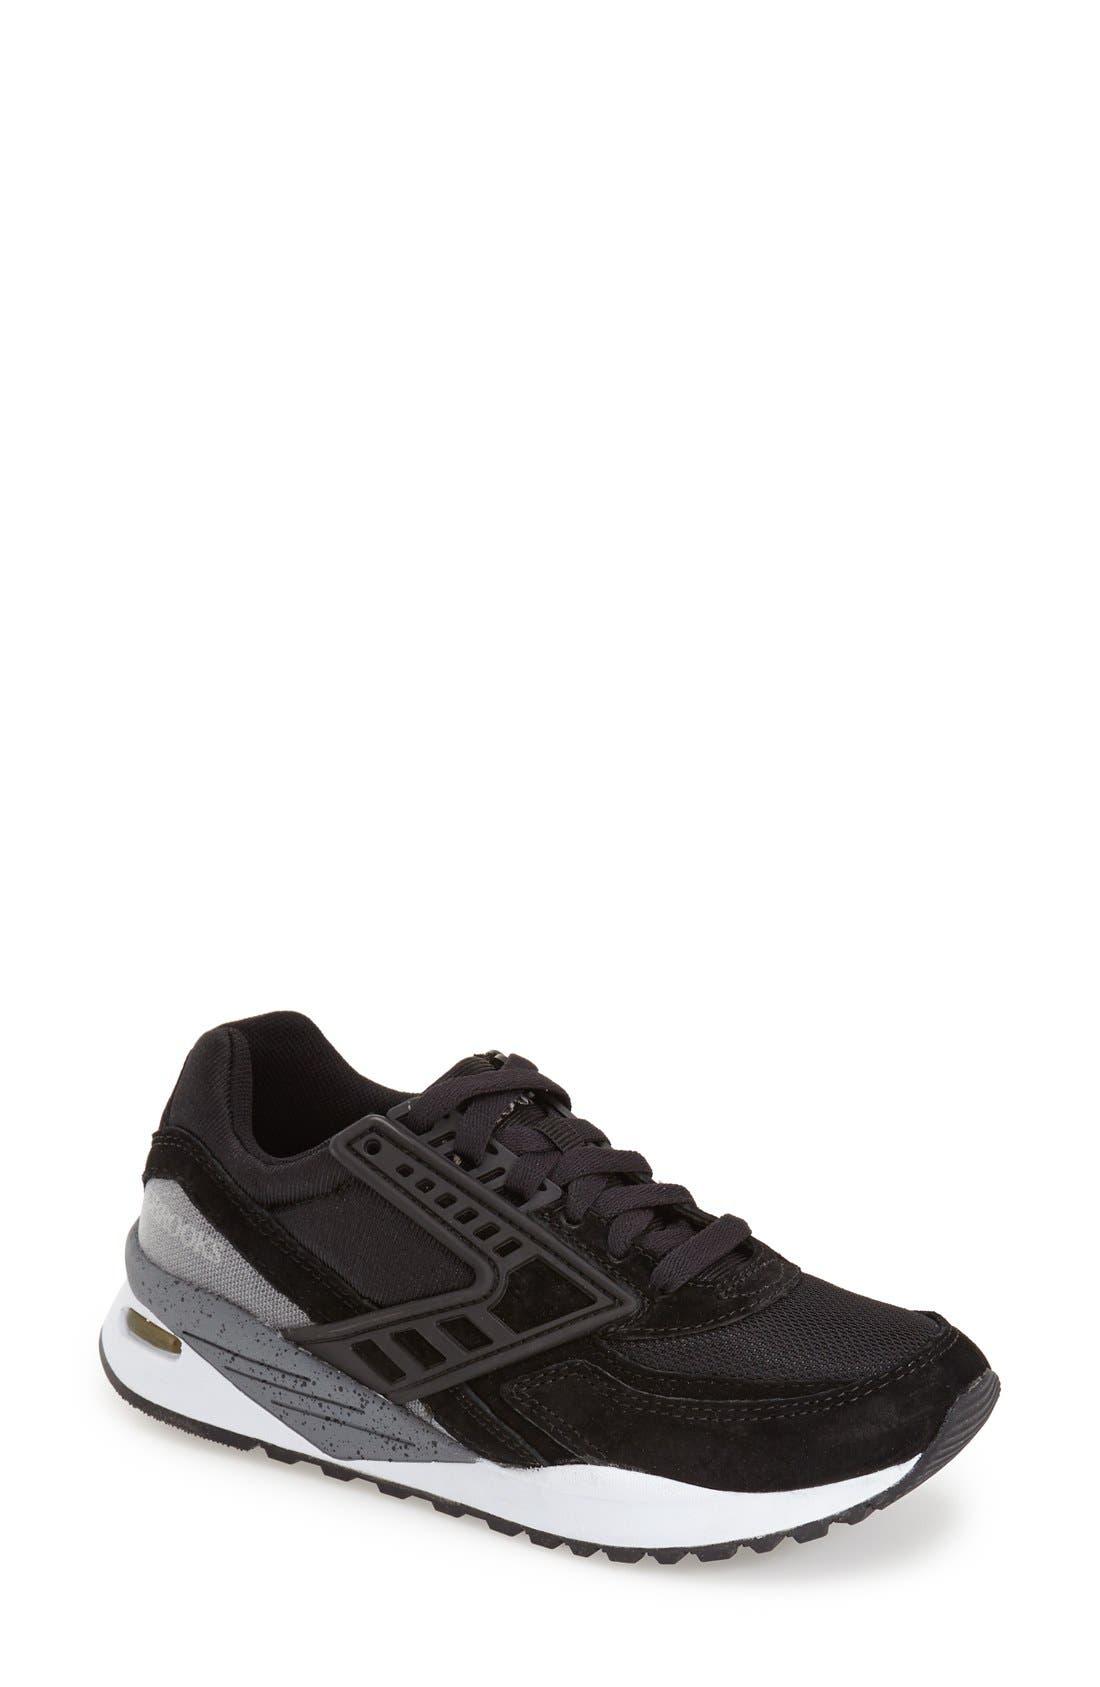 'Evenfall Regent' Sneaker,                             Main thumbnail 1, color,                             091